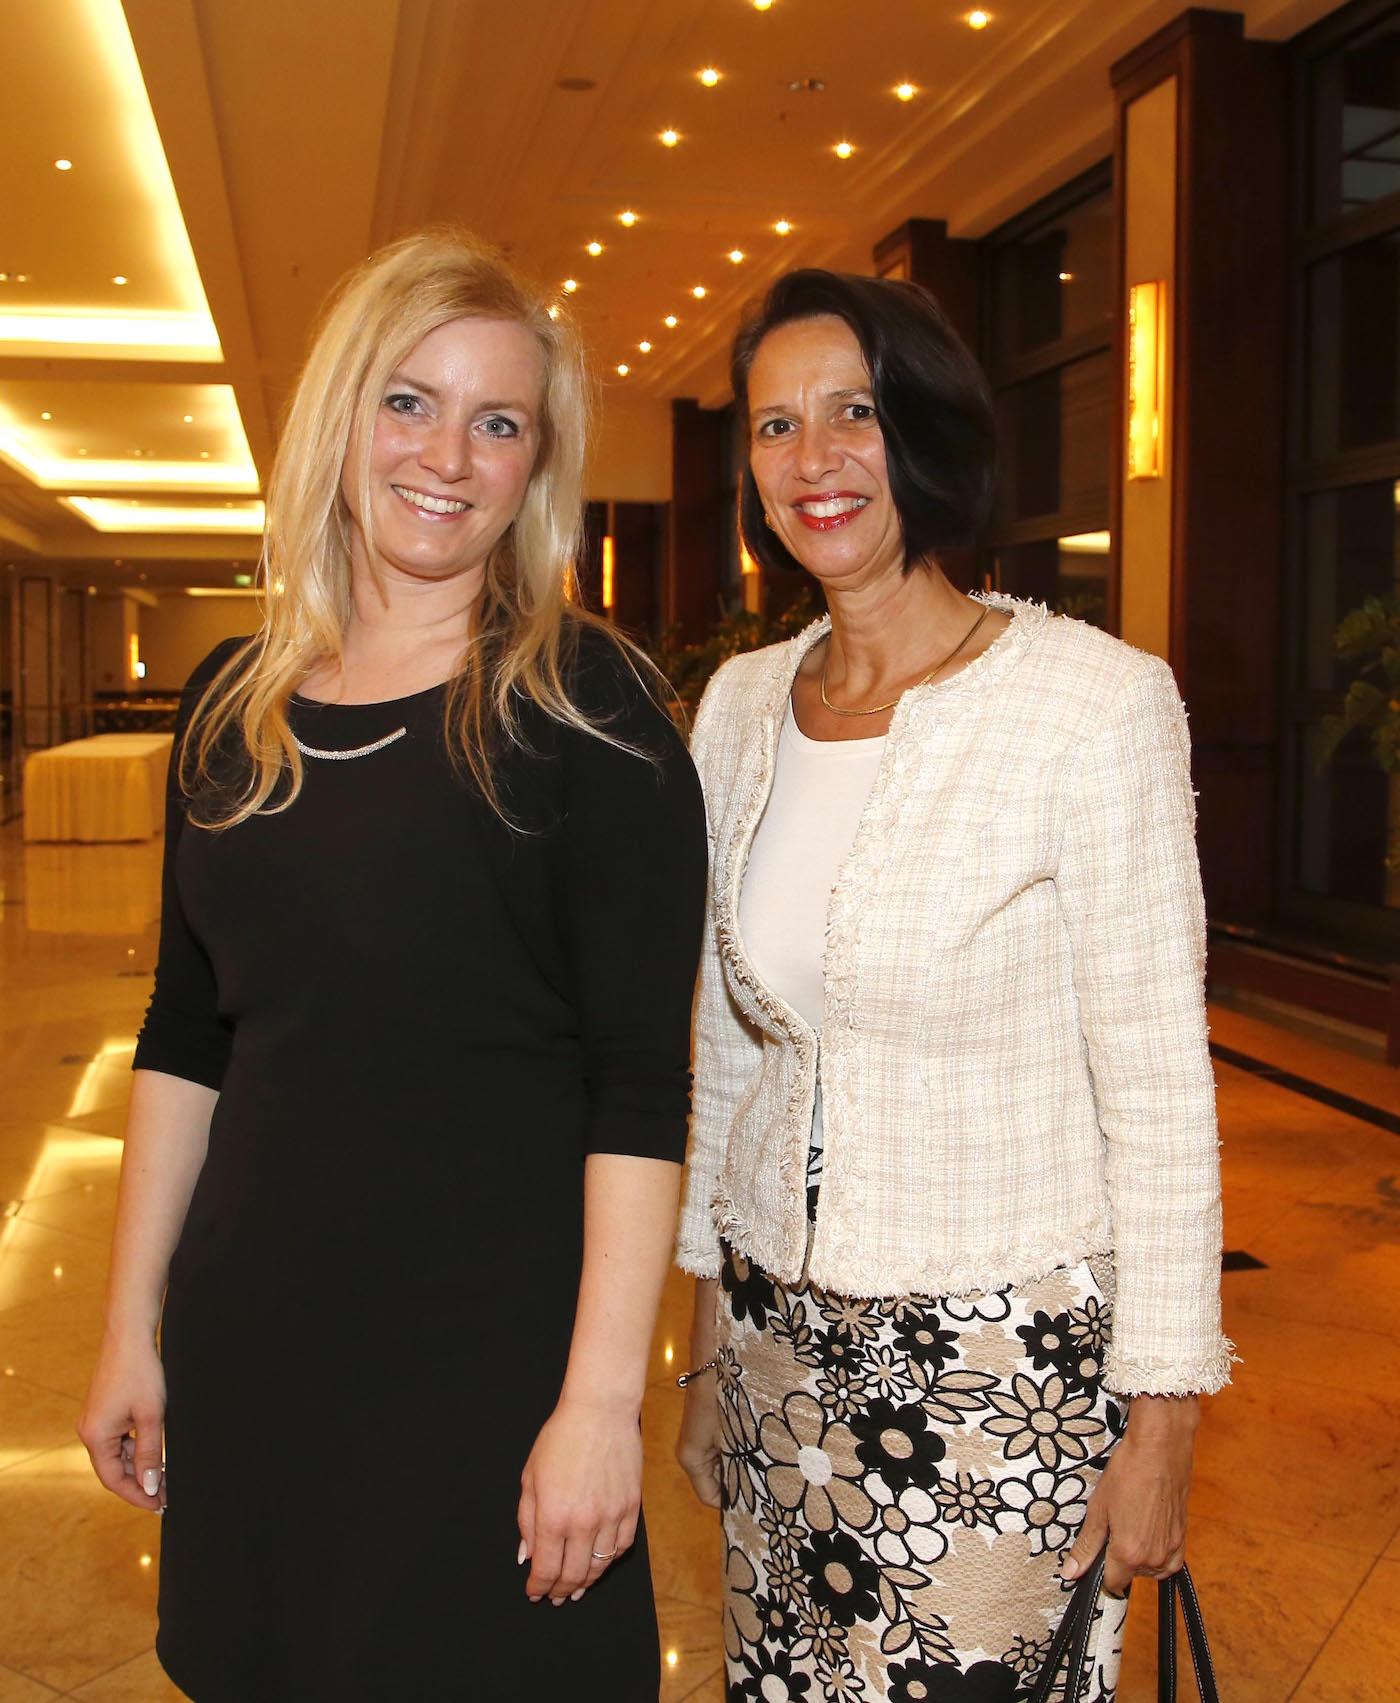 Christina Riess, I.E. Christine Schraner Burgener (Botschafterin Schweiz) bei der Ambassadors Club Veranstaltung -Women for Peace- im MARITIM Hotel berlin.